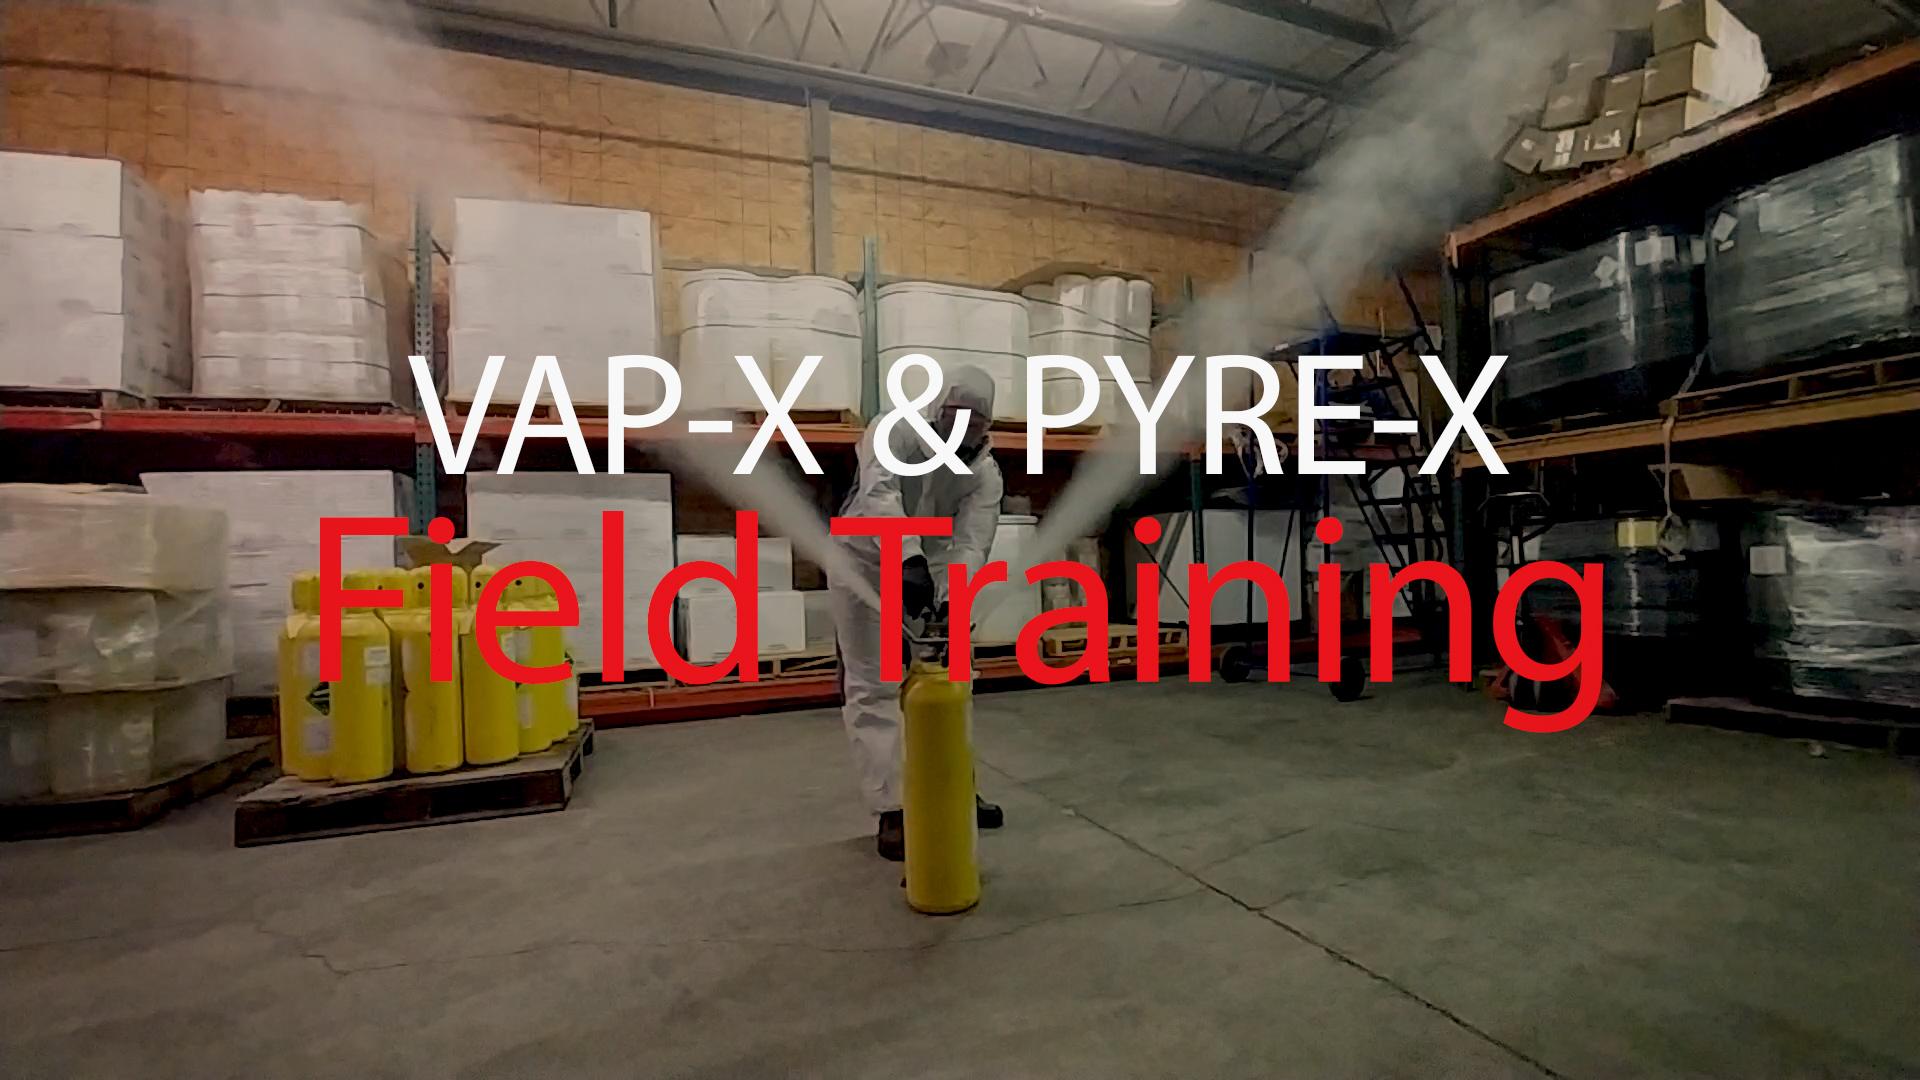 Vap-X™ & Pyre-X™ Field Training